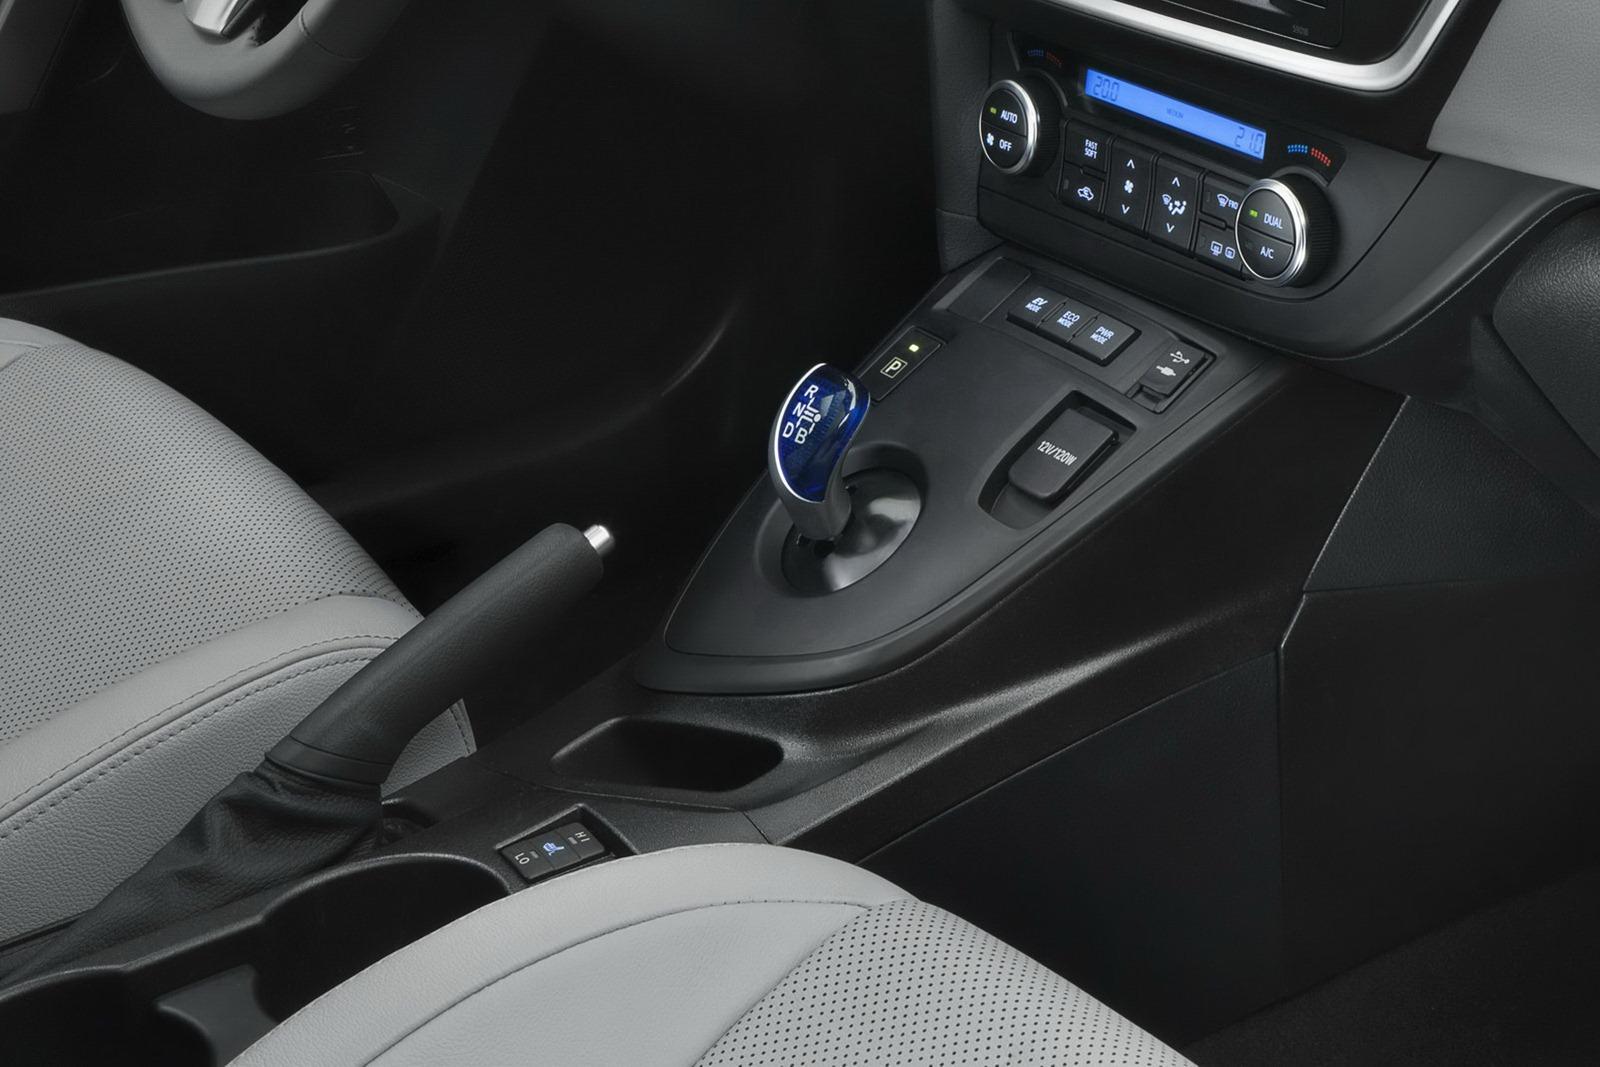 2013 toyota auris c segment hatchback unveiled paul tan for Interior toyota auris 2018